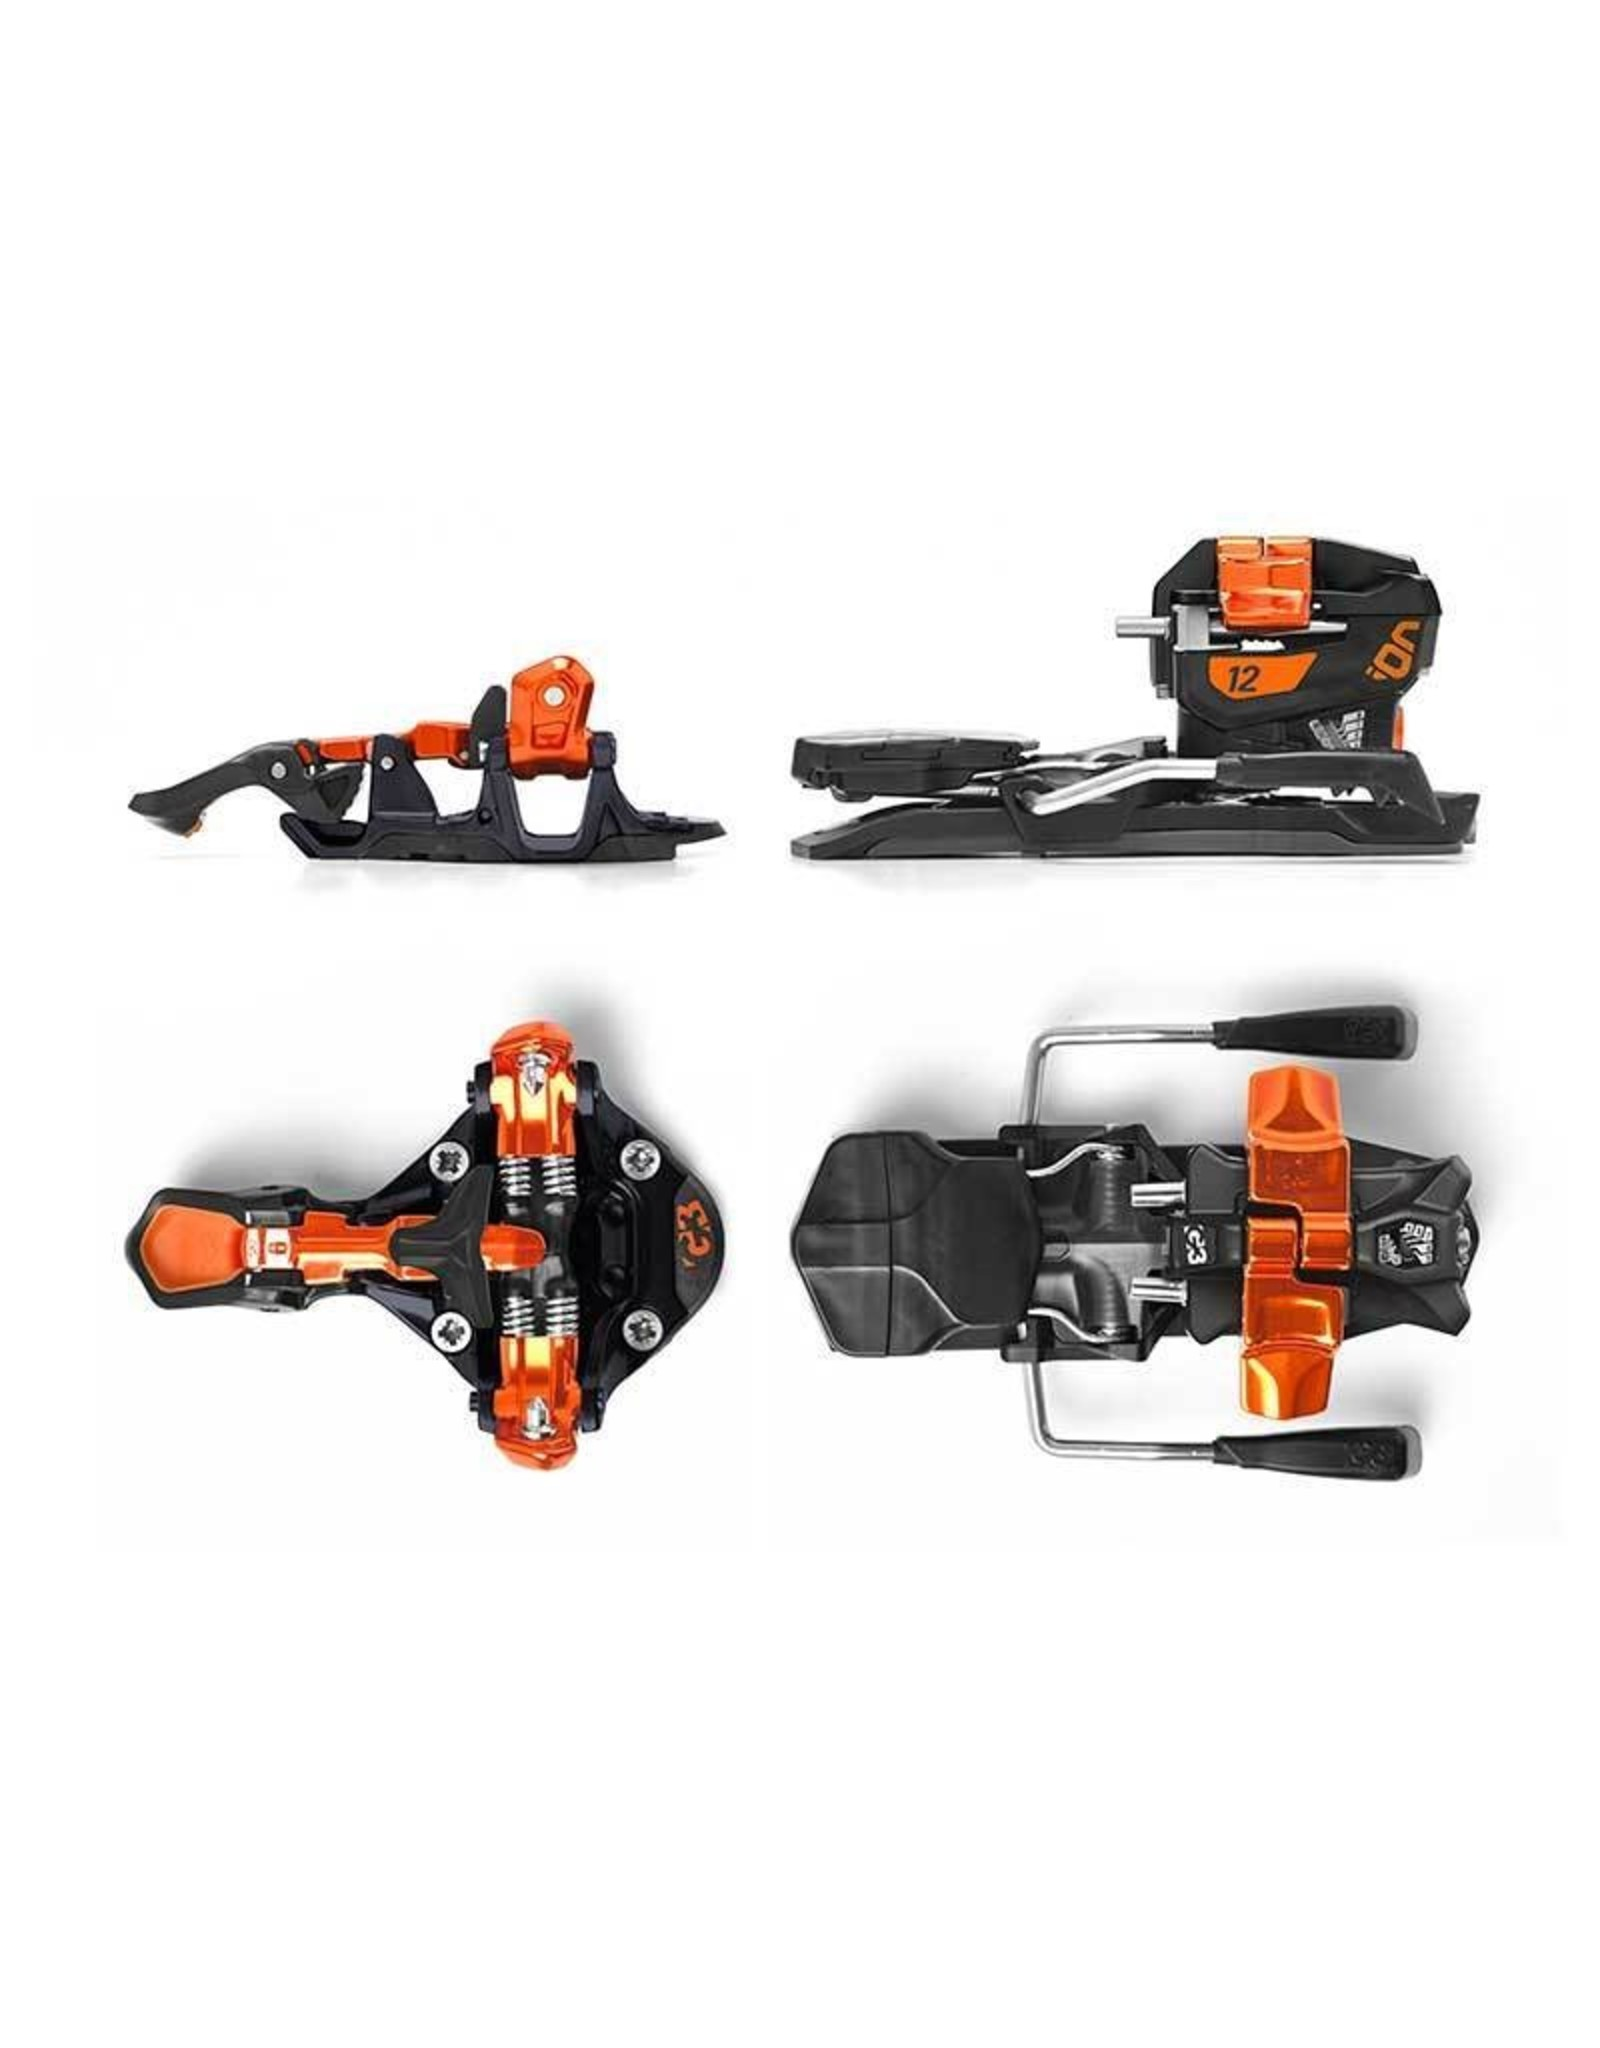 G3 G3 Ion 12 Bindings 100mm